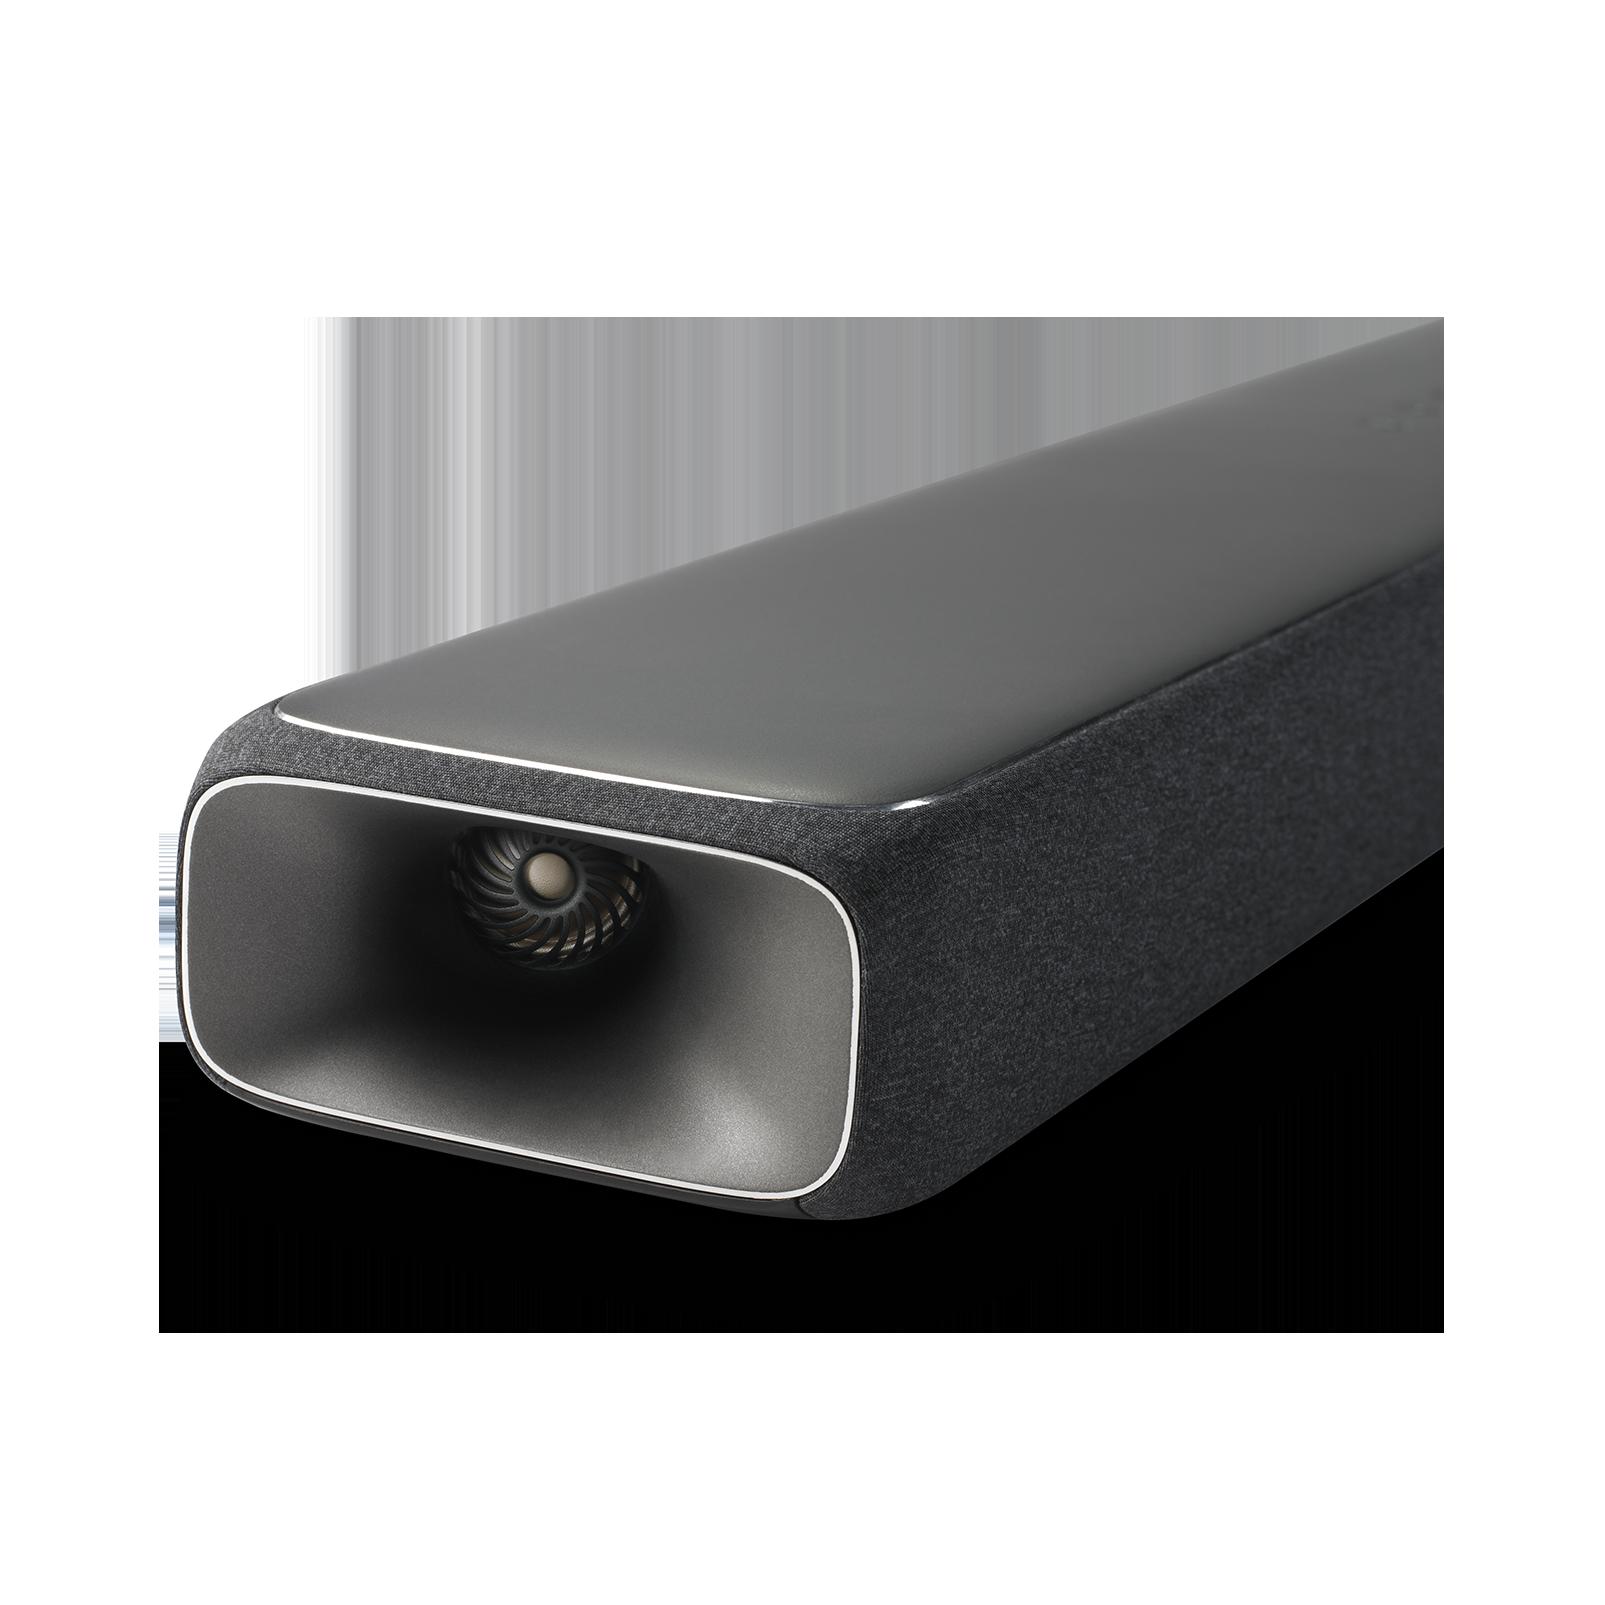 Enchant 800 - Graphite - All in One 8-Channel Soundbar with MultiBeam™ Surround Sound - Detailshot 3